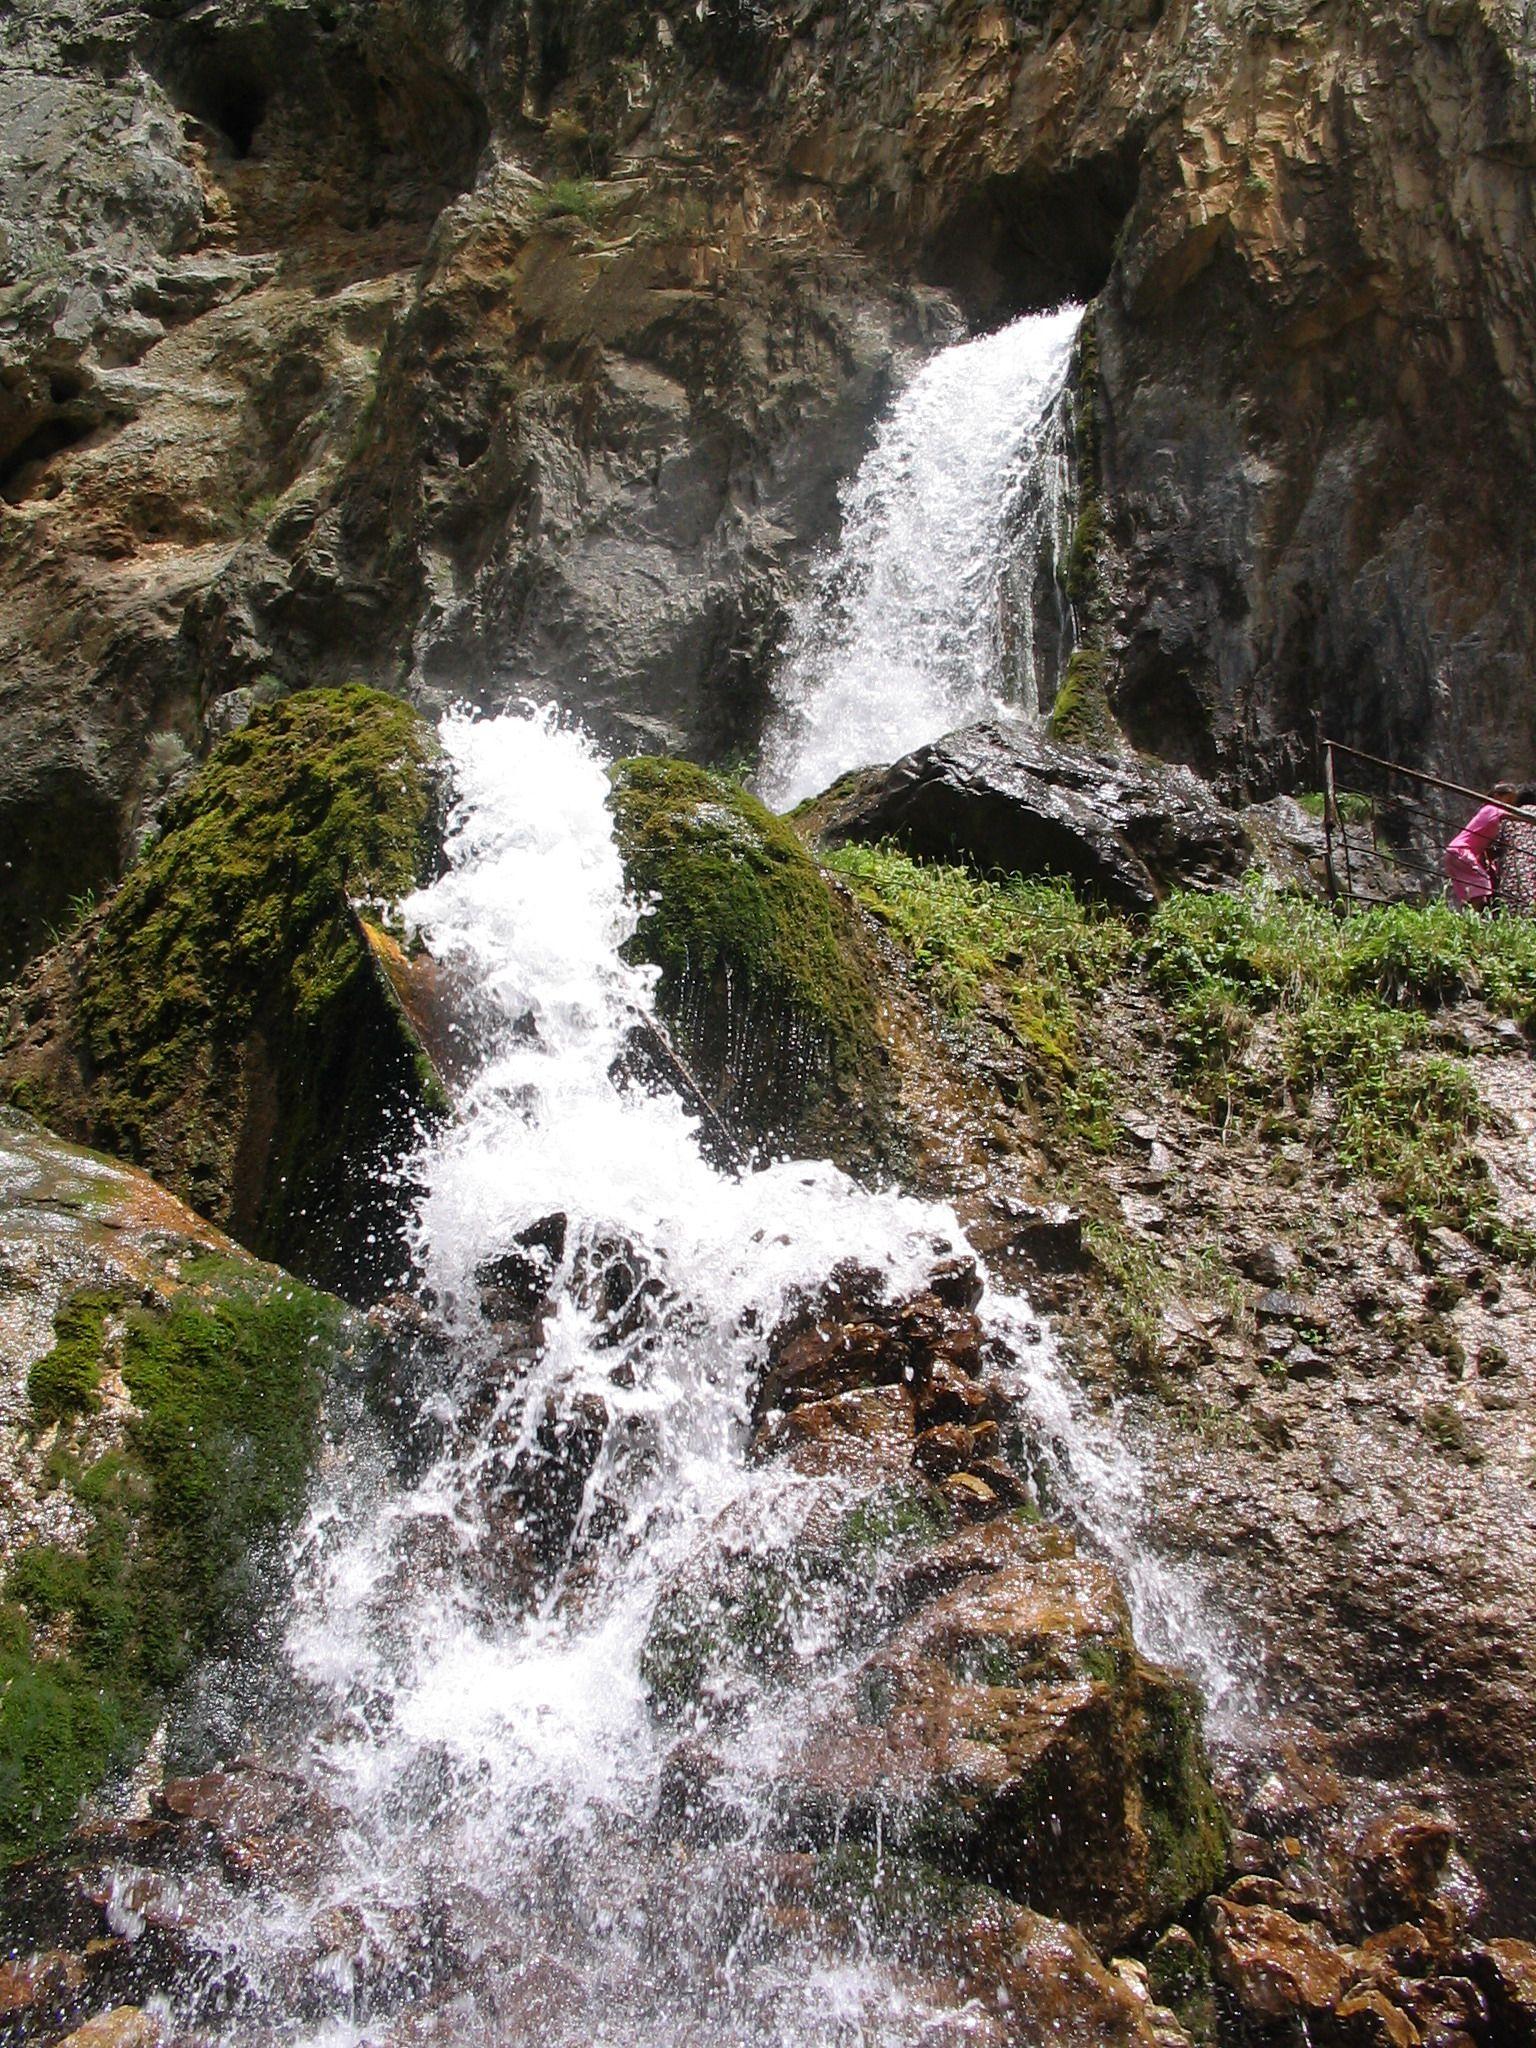 Abshir_waterfall_2